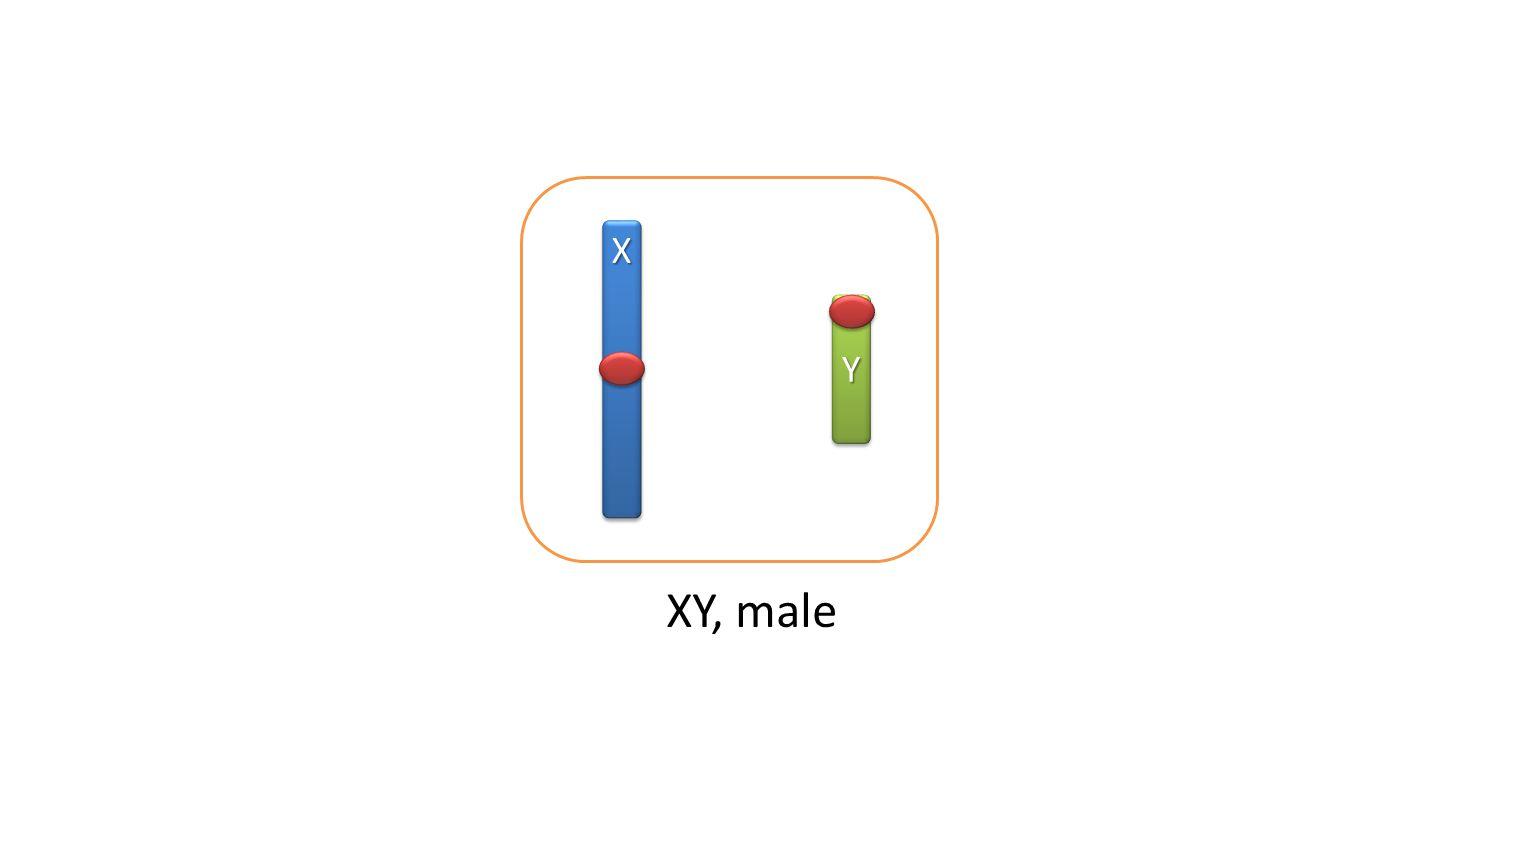 XY, male XX YY